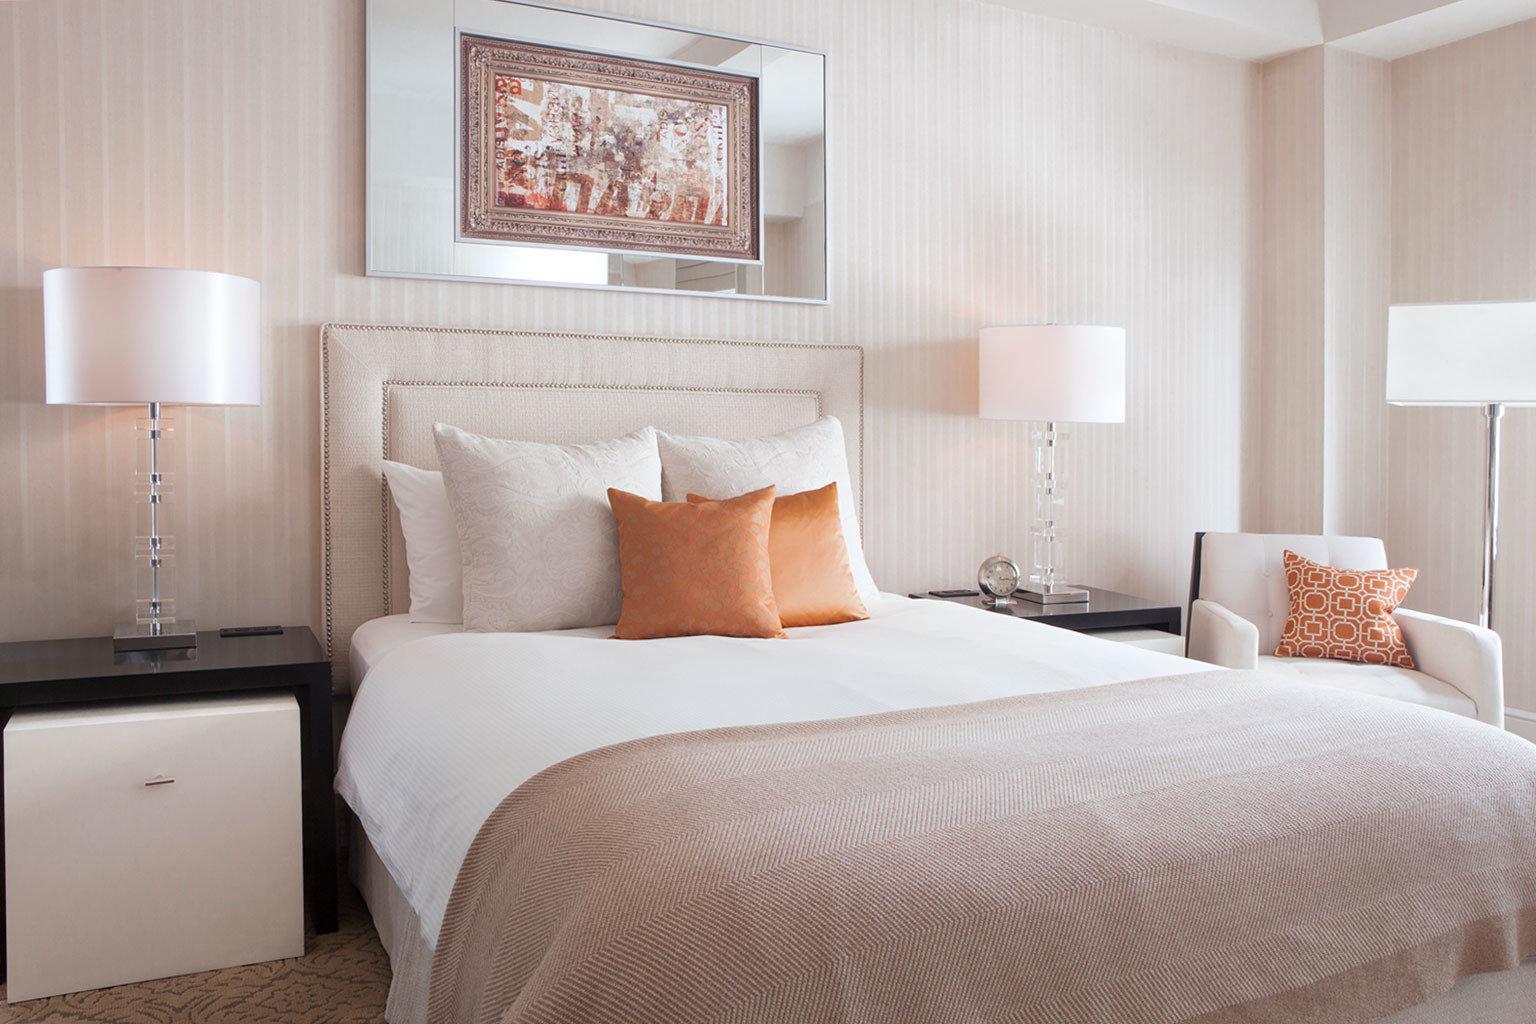 Bedroom Boutique City Modern Offbeat sofa property Suite scene bed sheet orange bed frame pillow cottage duvet cover lamp